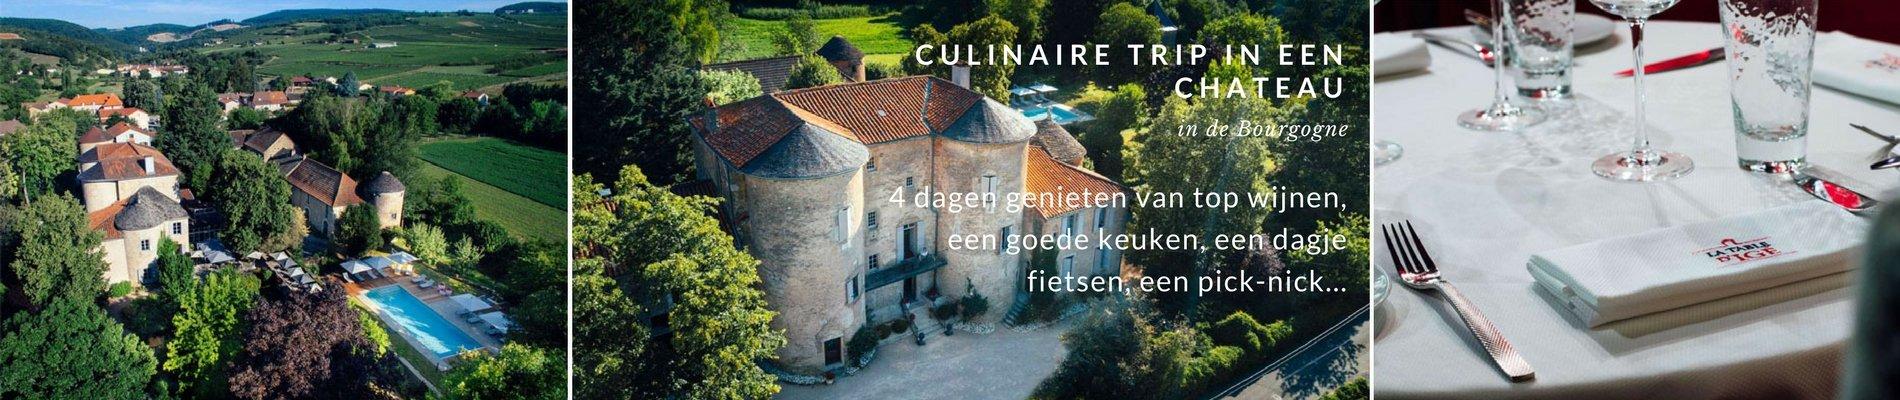 Culinair fietsarrangement Chateau Igé